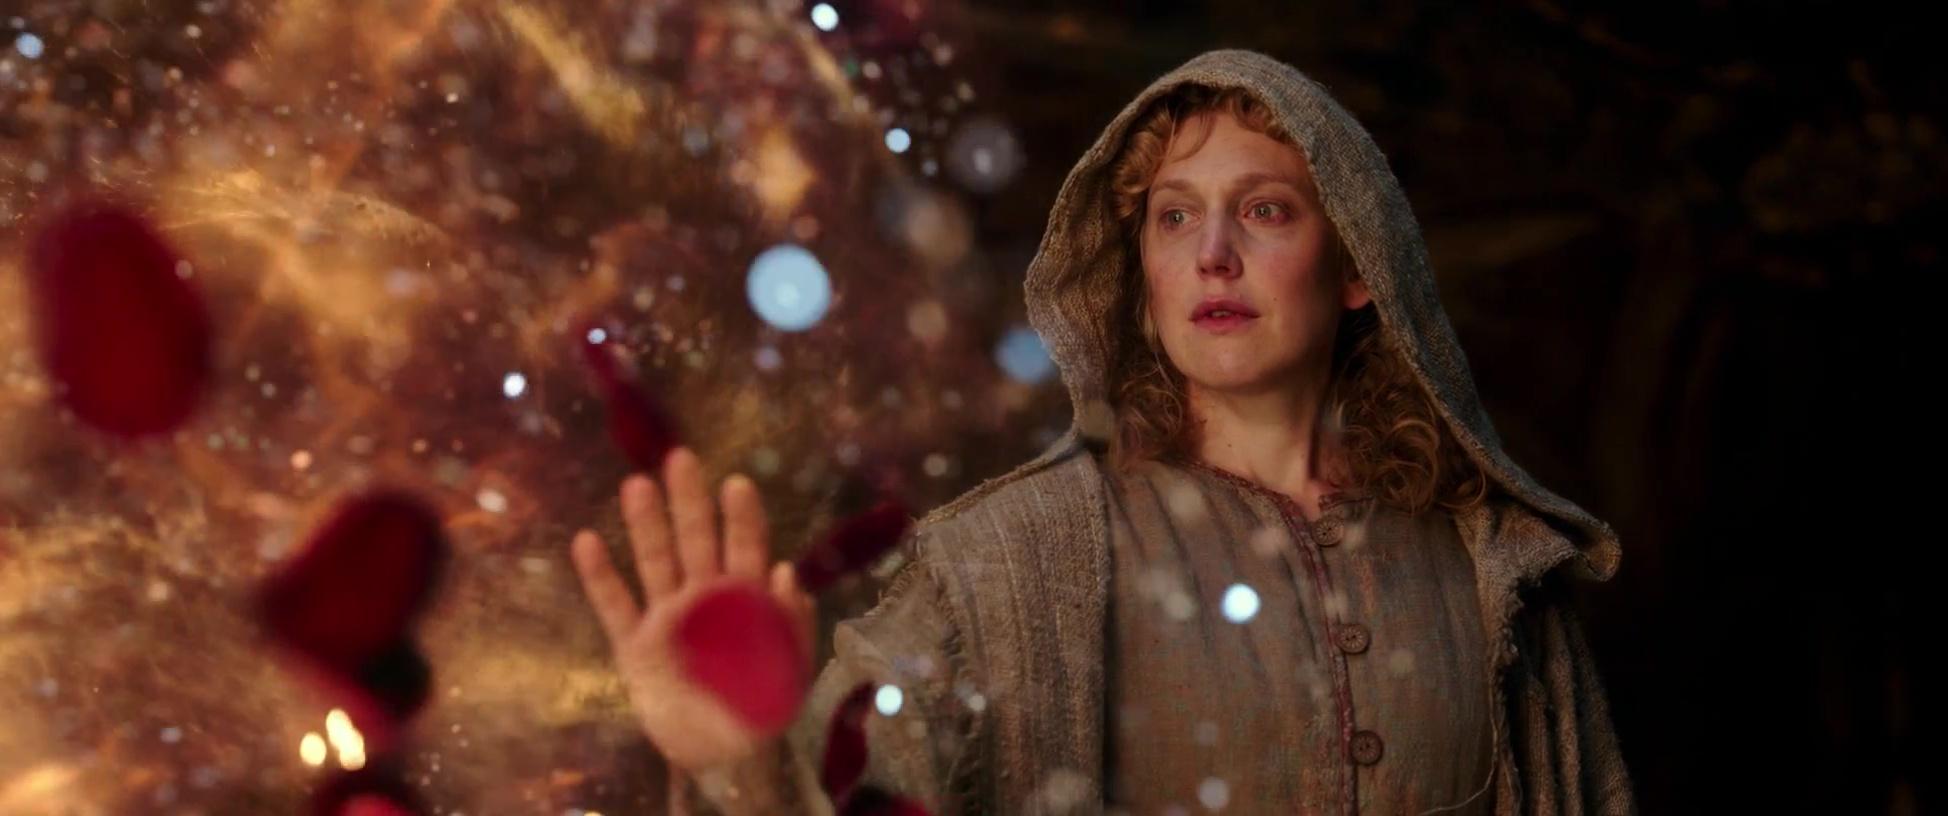 enchanteresse enchantress agathe personnage belle bete film 2017 beauty beast character disney